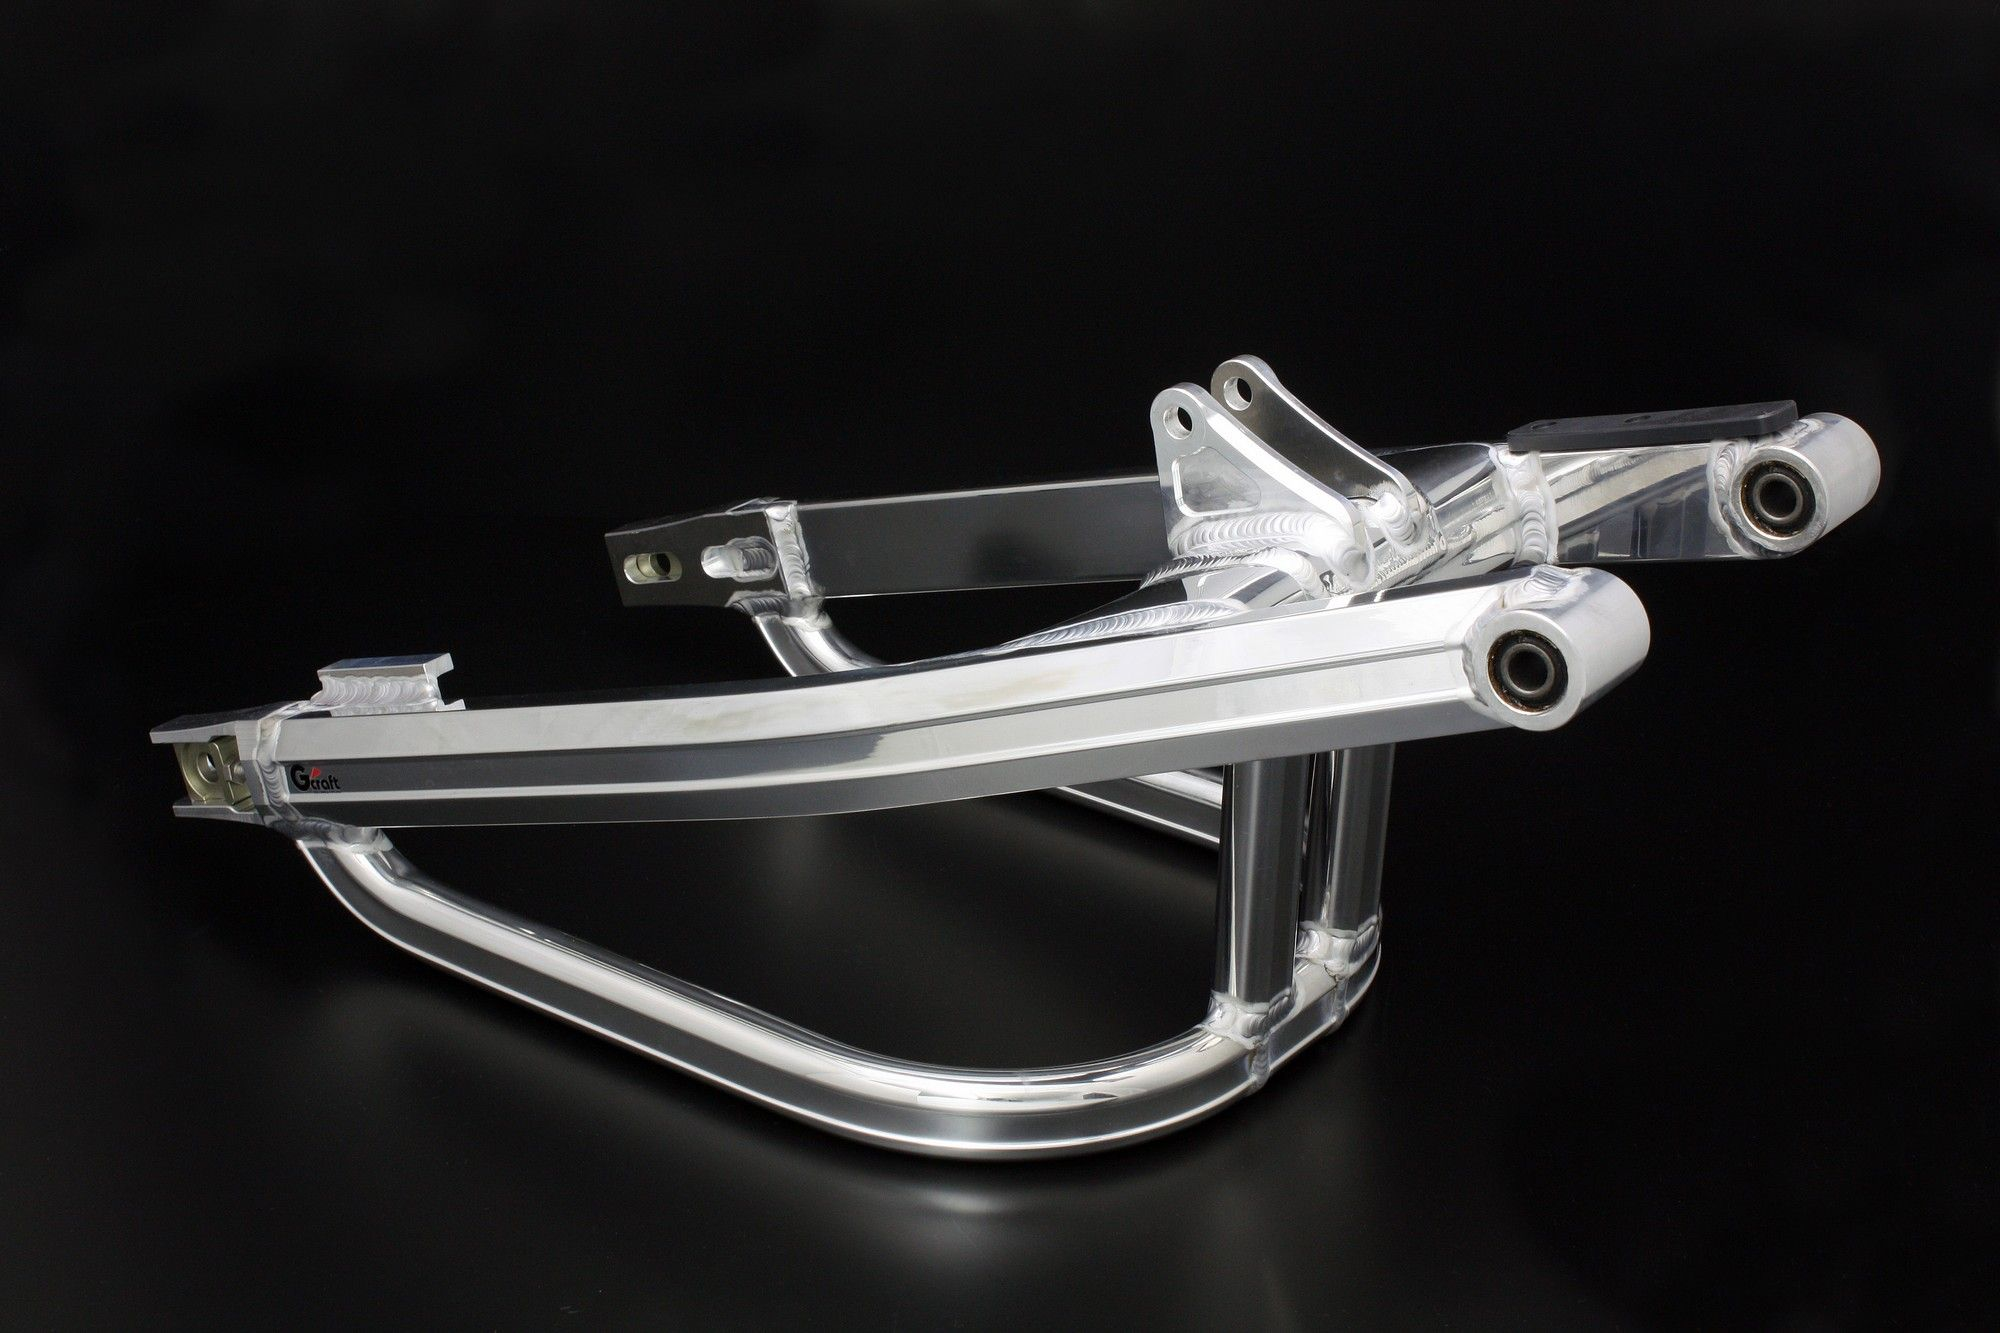 【G-Craft】GROM專用多角形後搖臂 (附平衡支架) - 「Webike-摩托百貨」